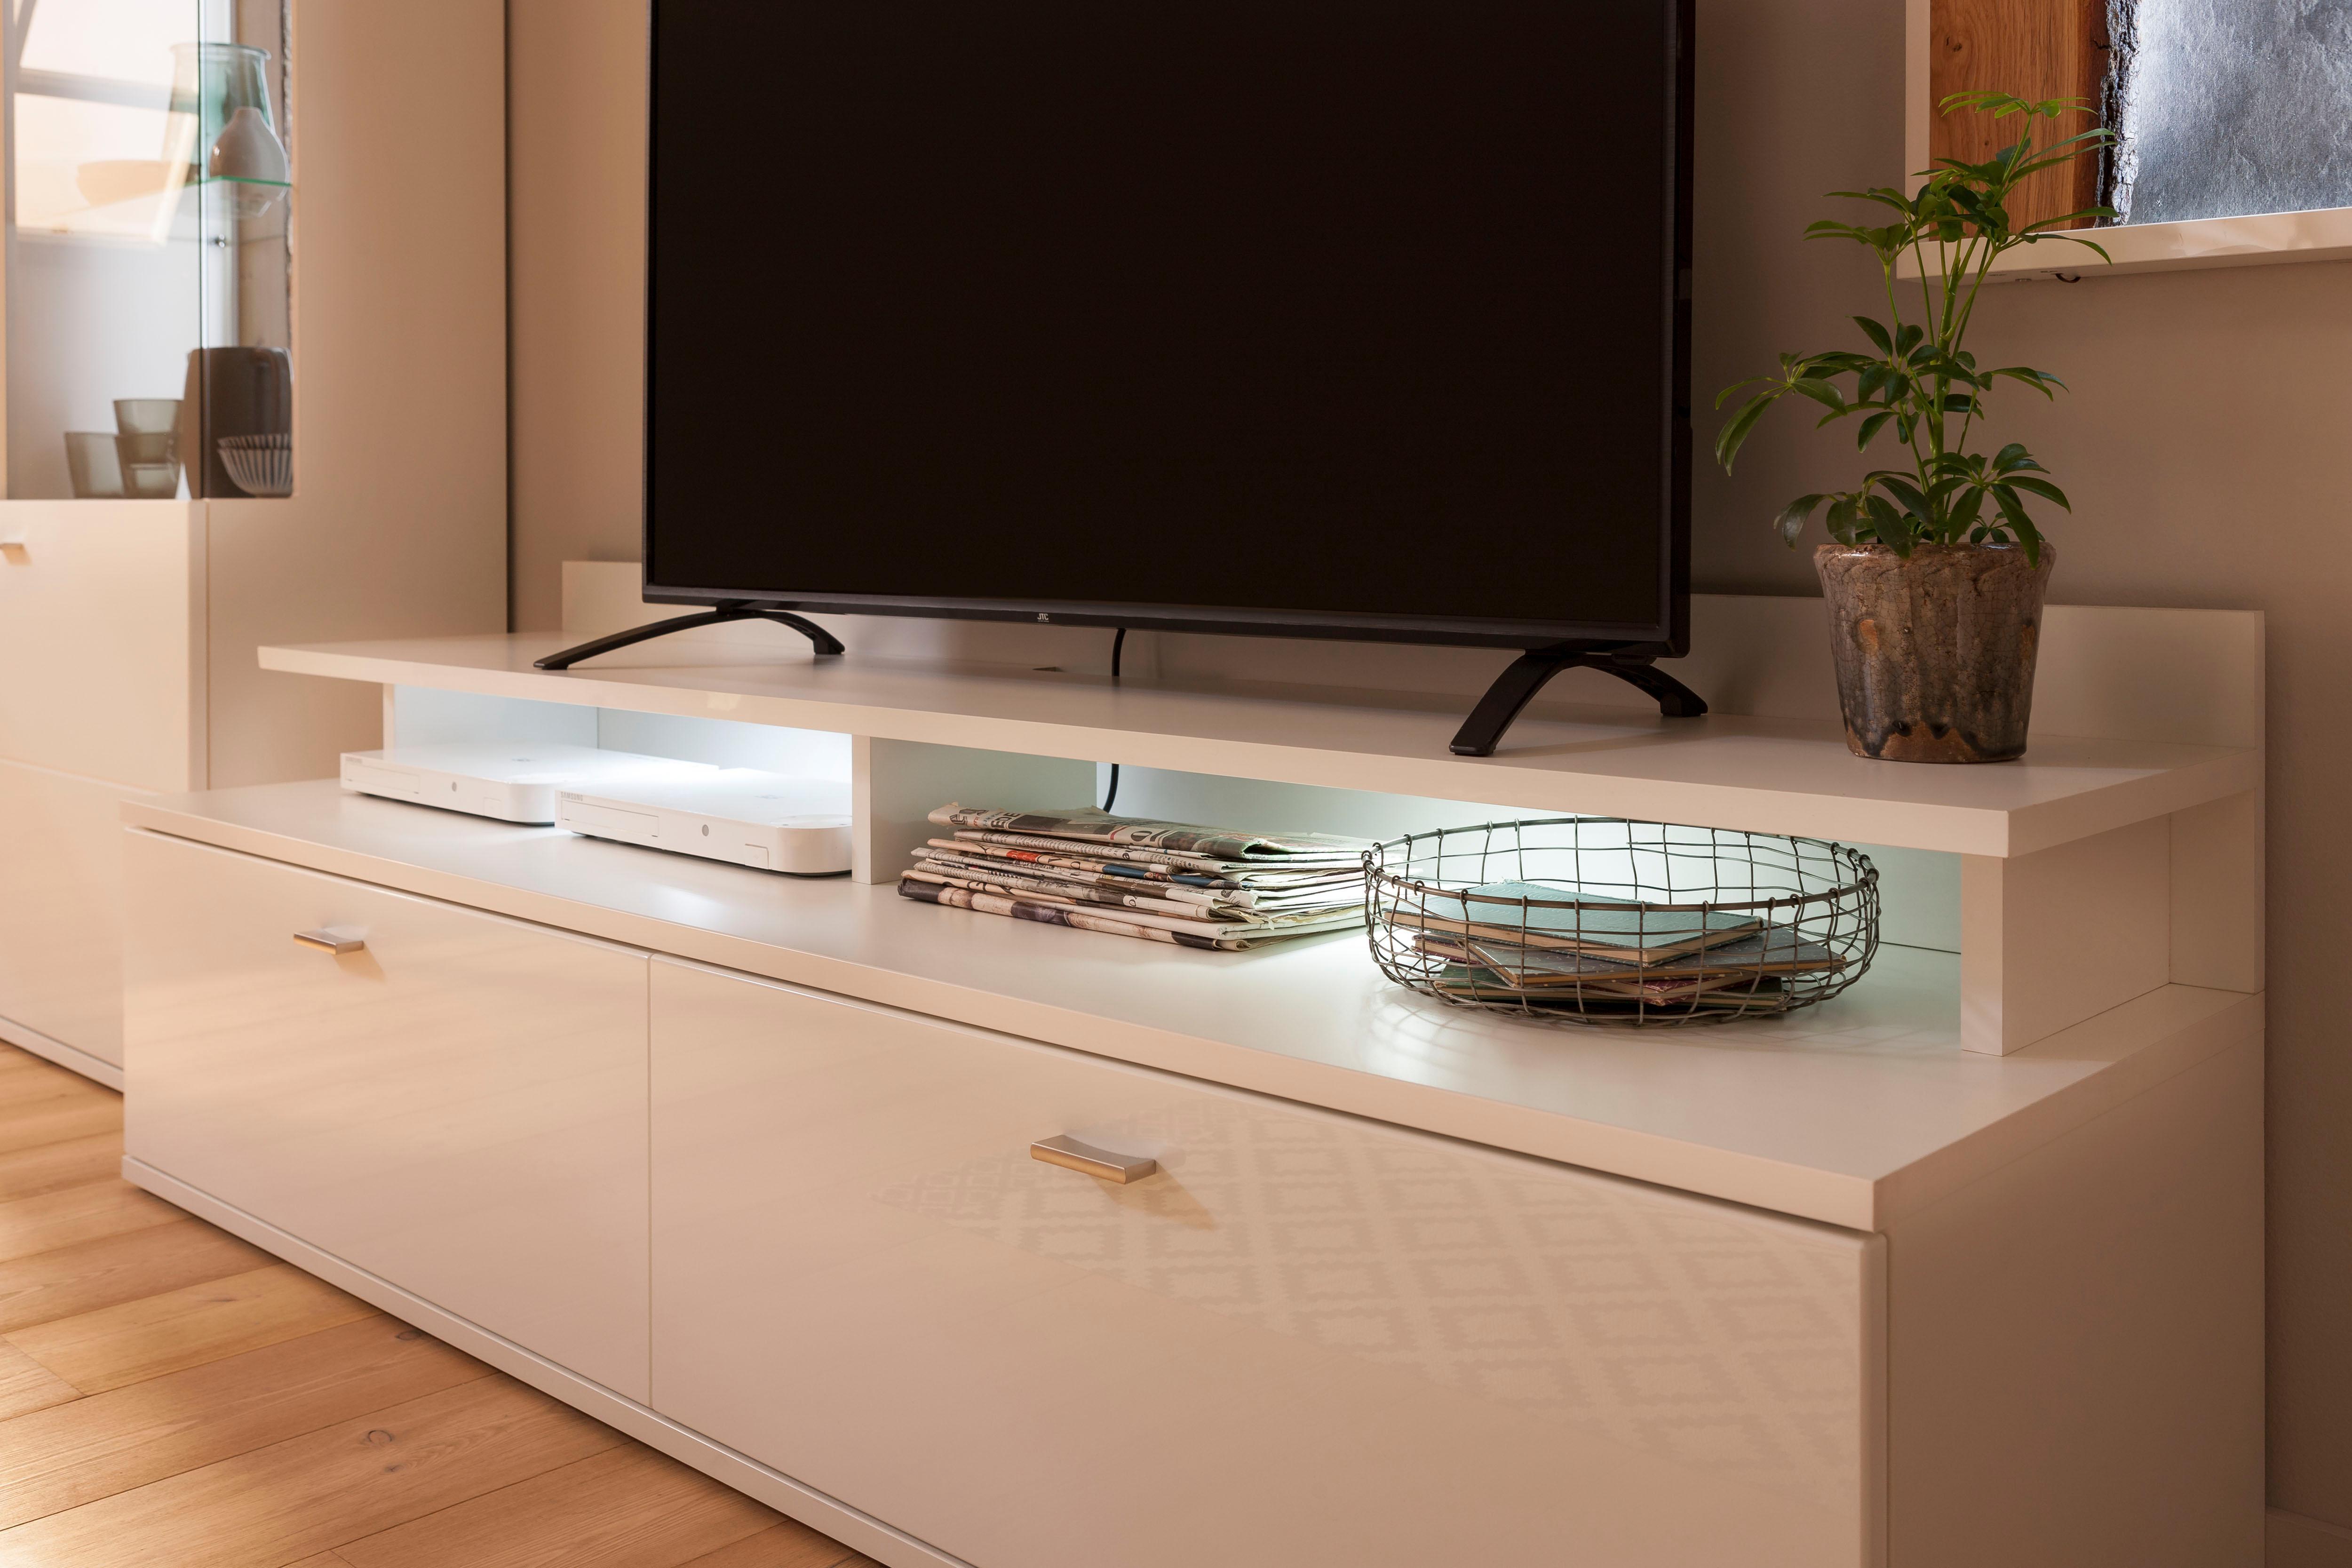 set one by Musterring TV-Aufsatz TACOMA Typ 62 Breite 150 cm